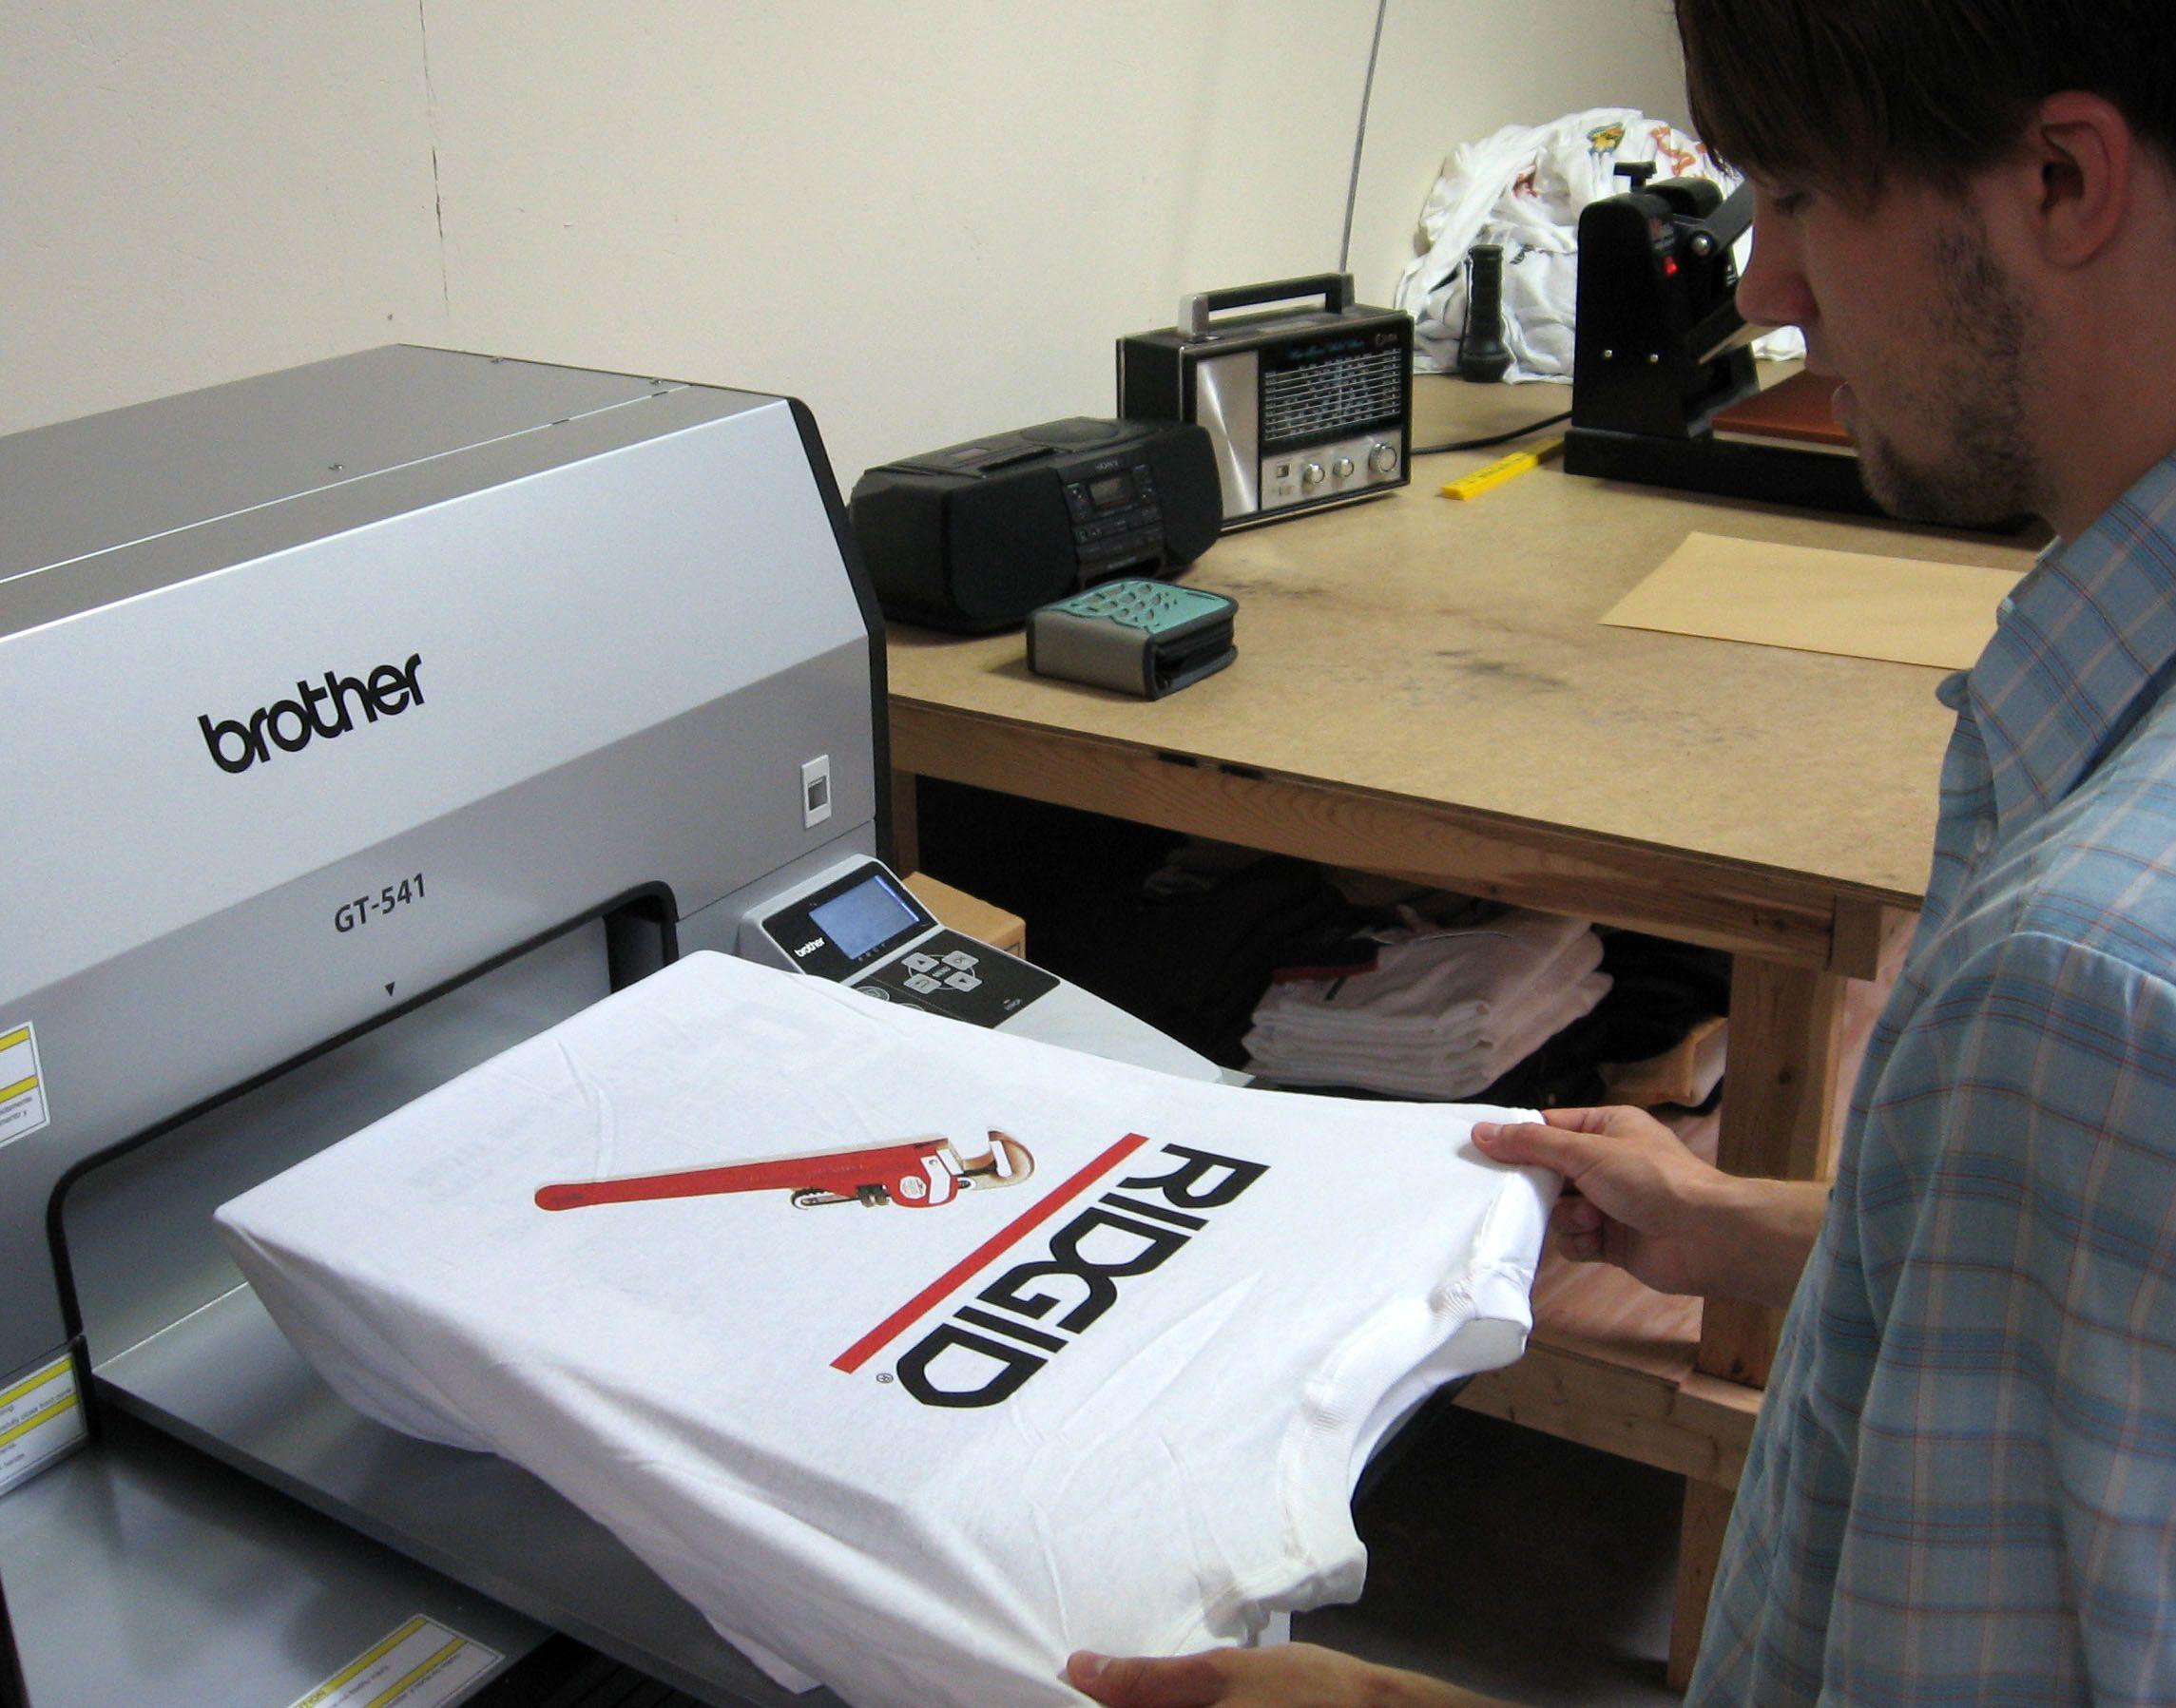 T Shirt Printing Cool T Shirt Designs Pinterest Printed Shirts